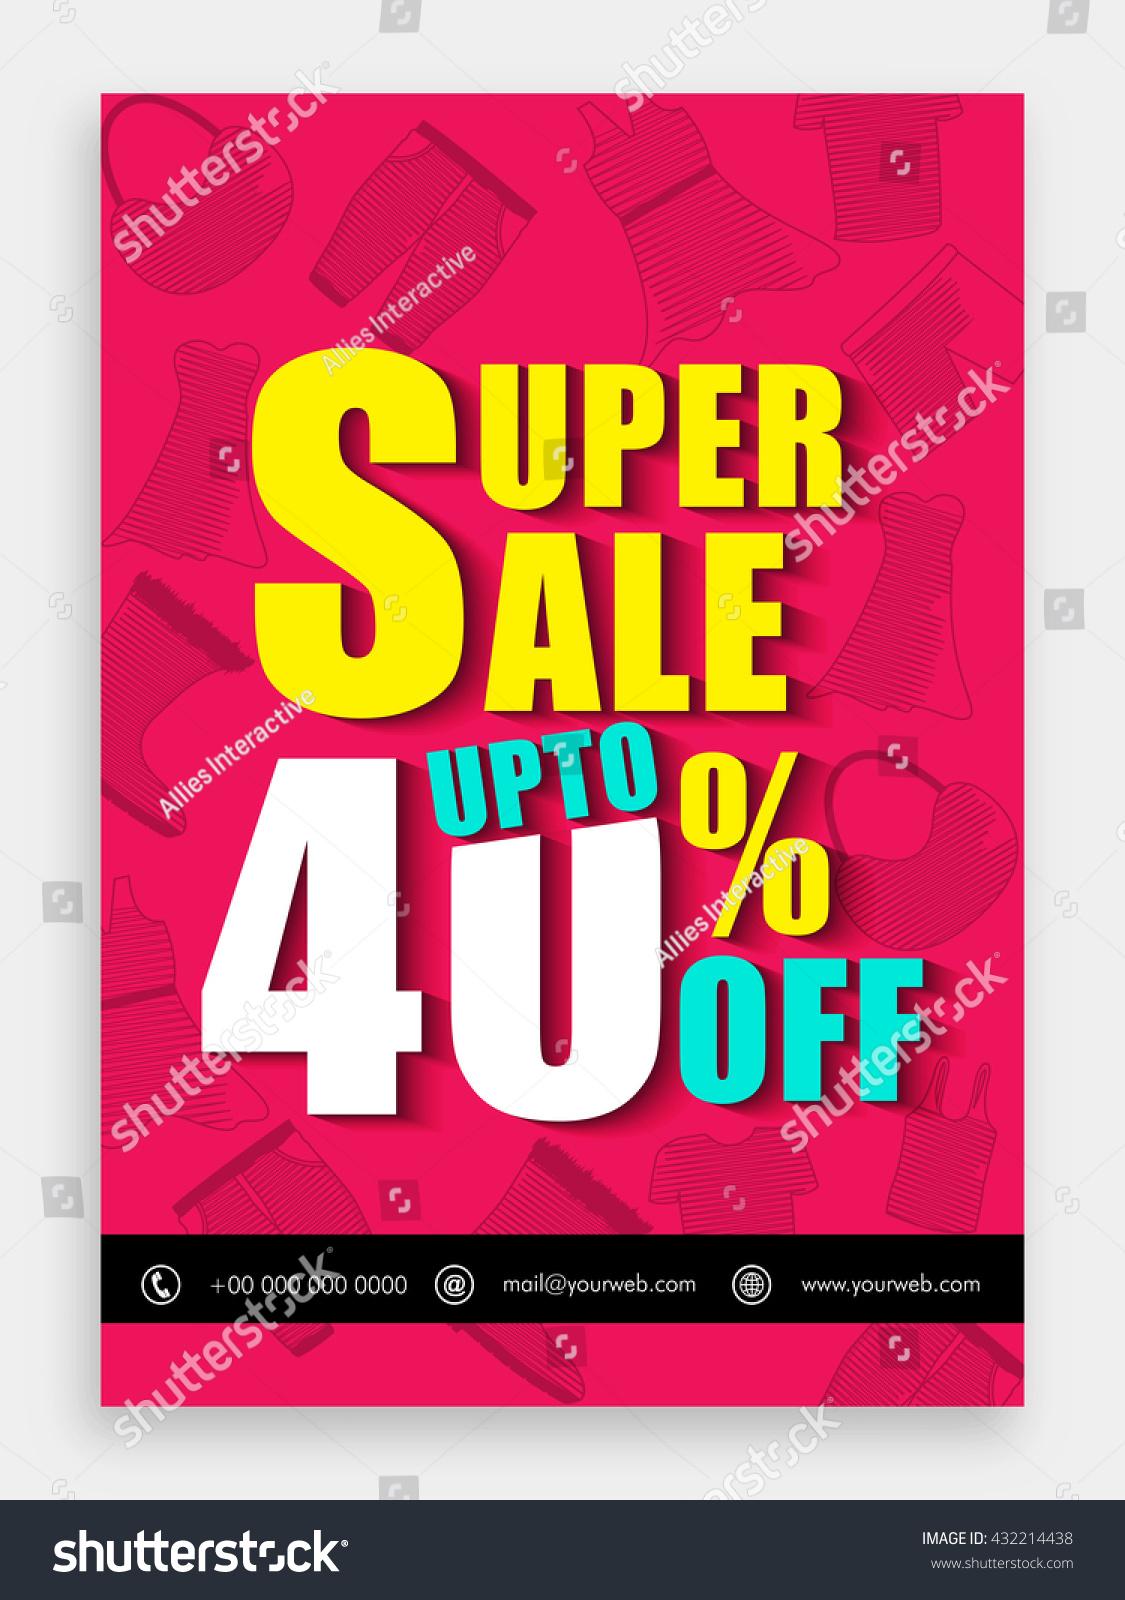 super template banner stock vector  super template banner flyer upto 40% off creative